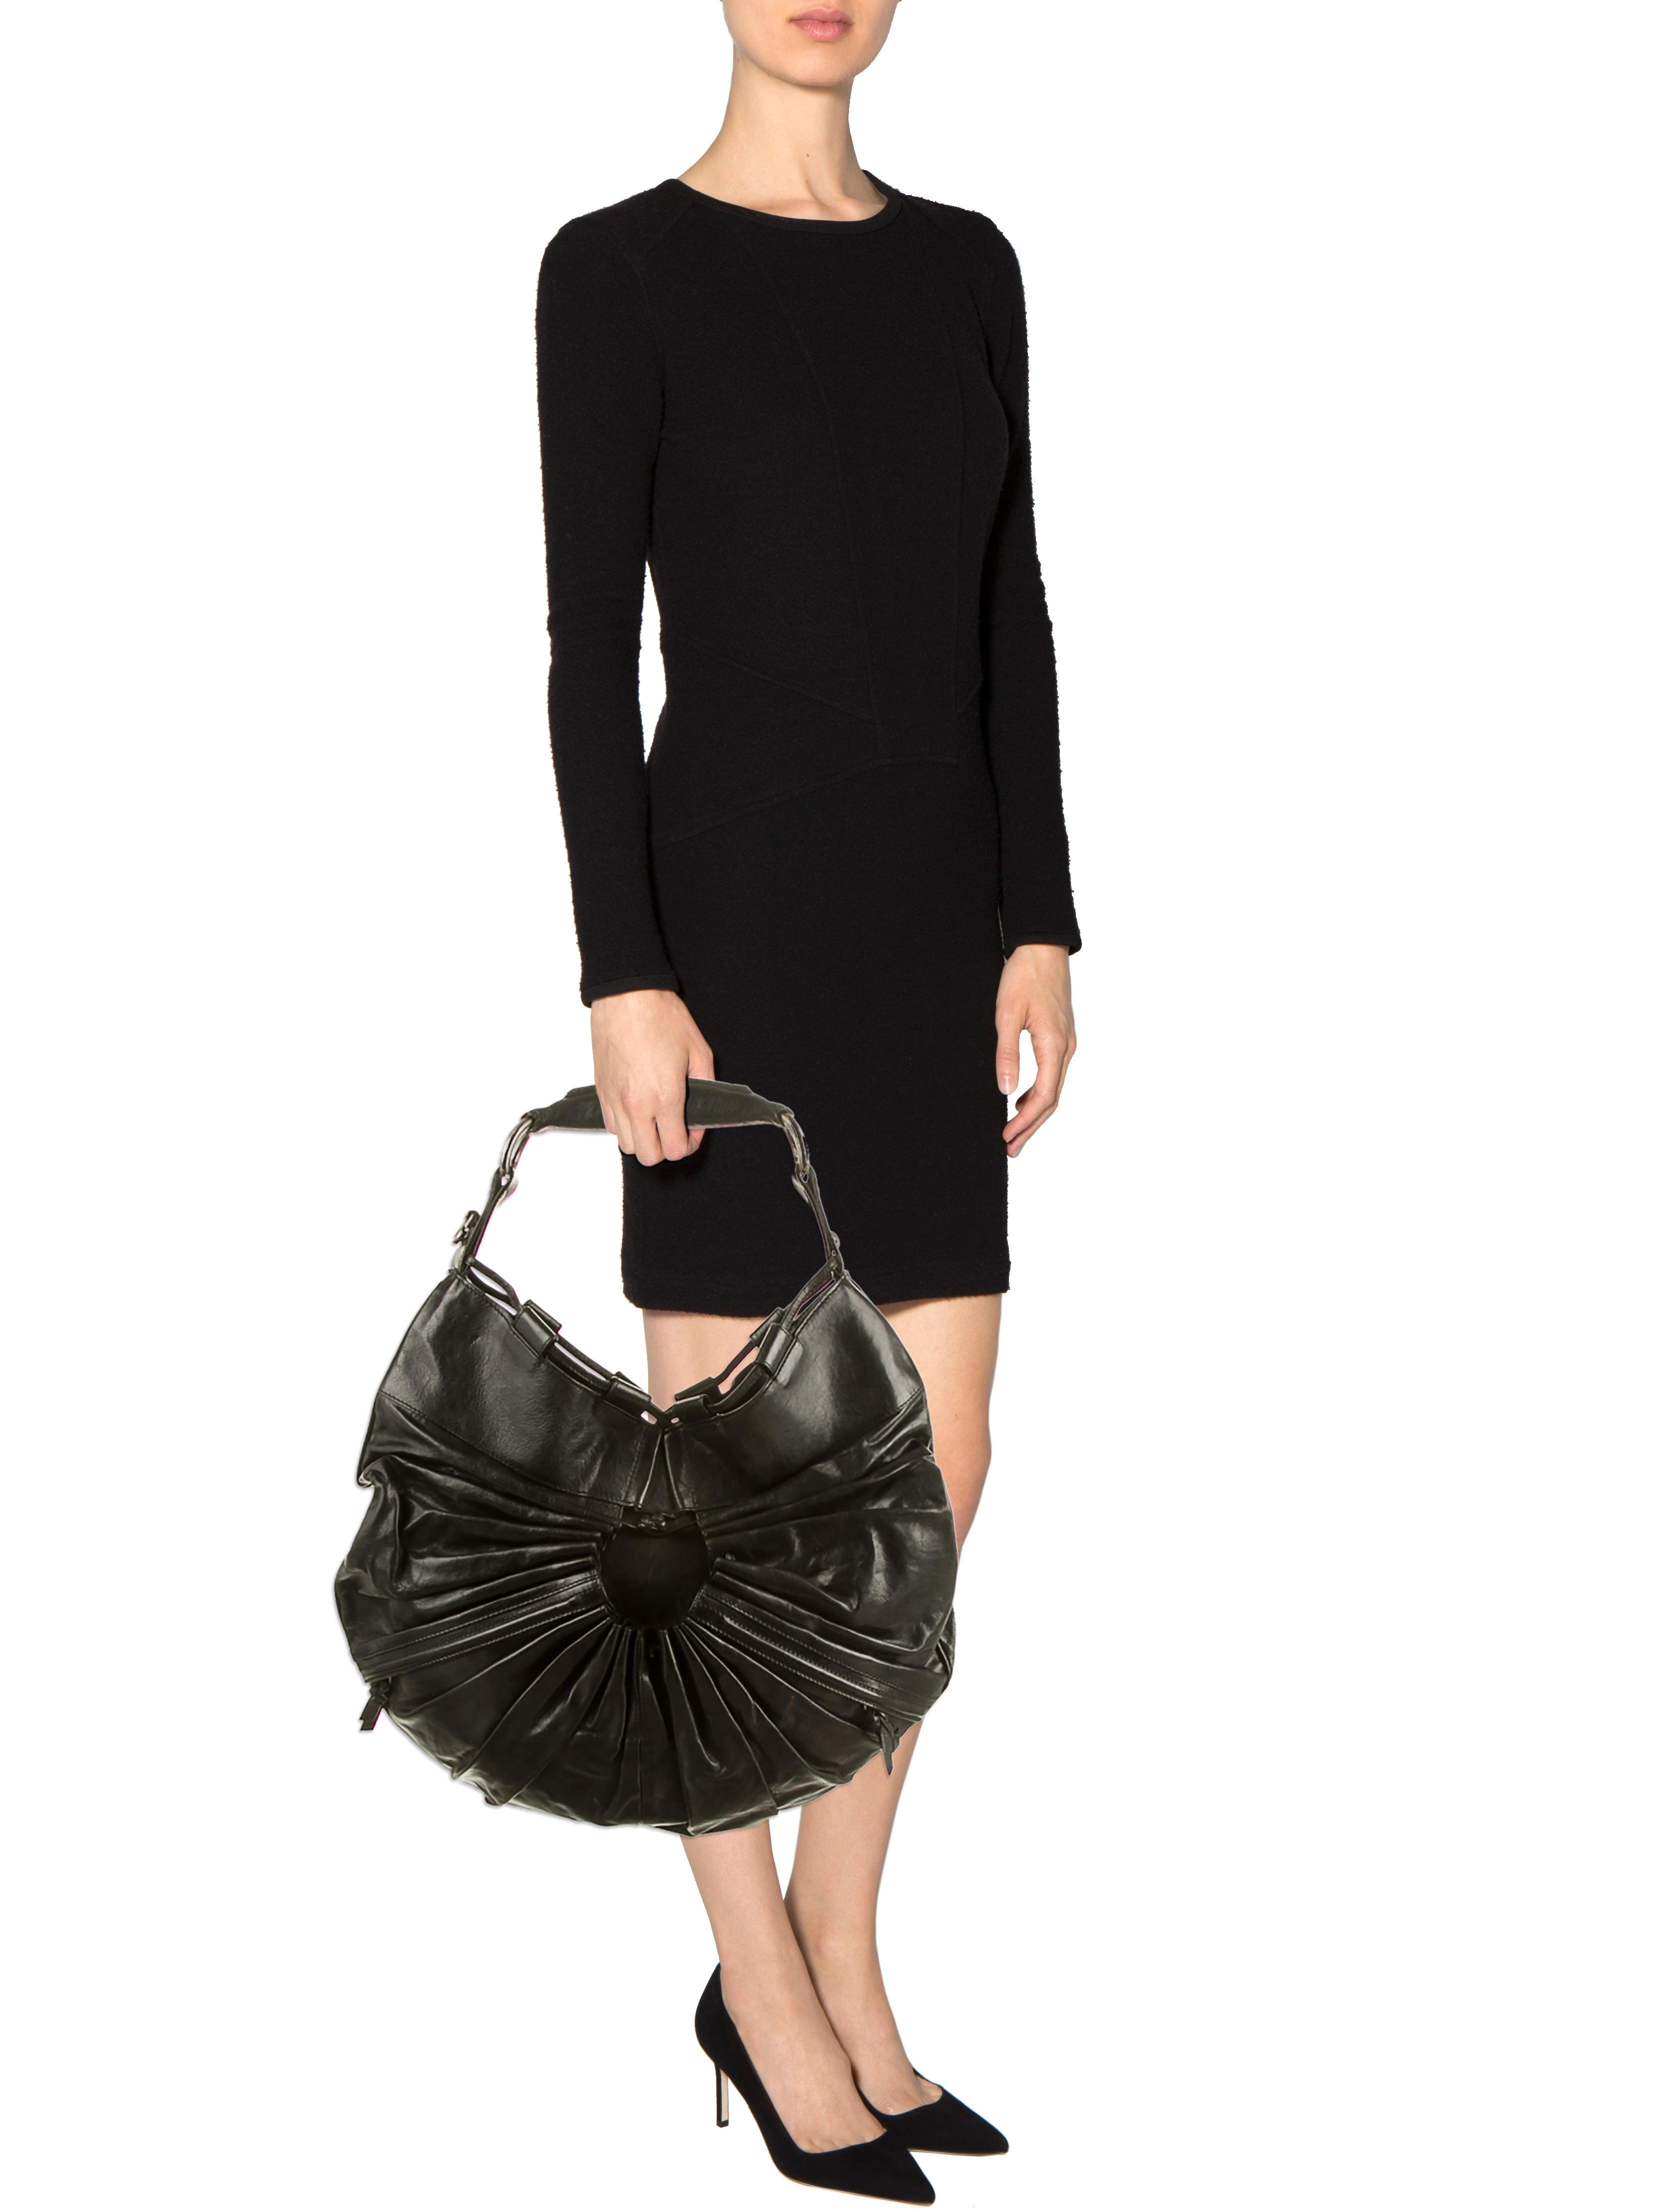 Cocktail dress costume national handbags